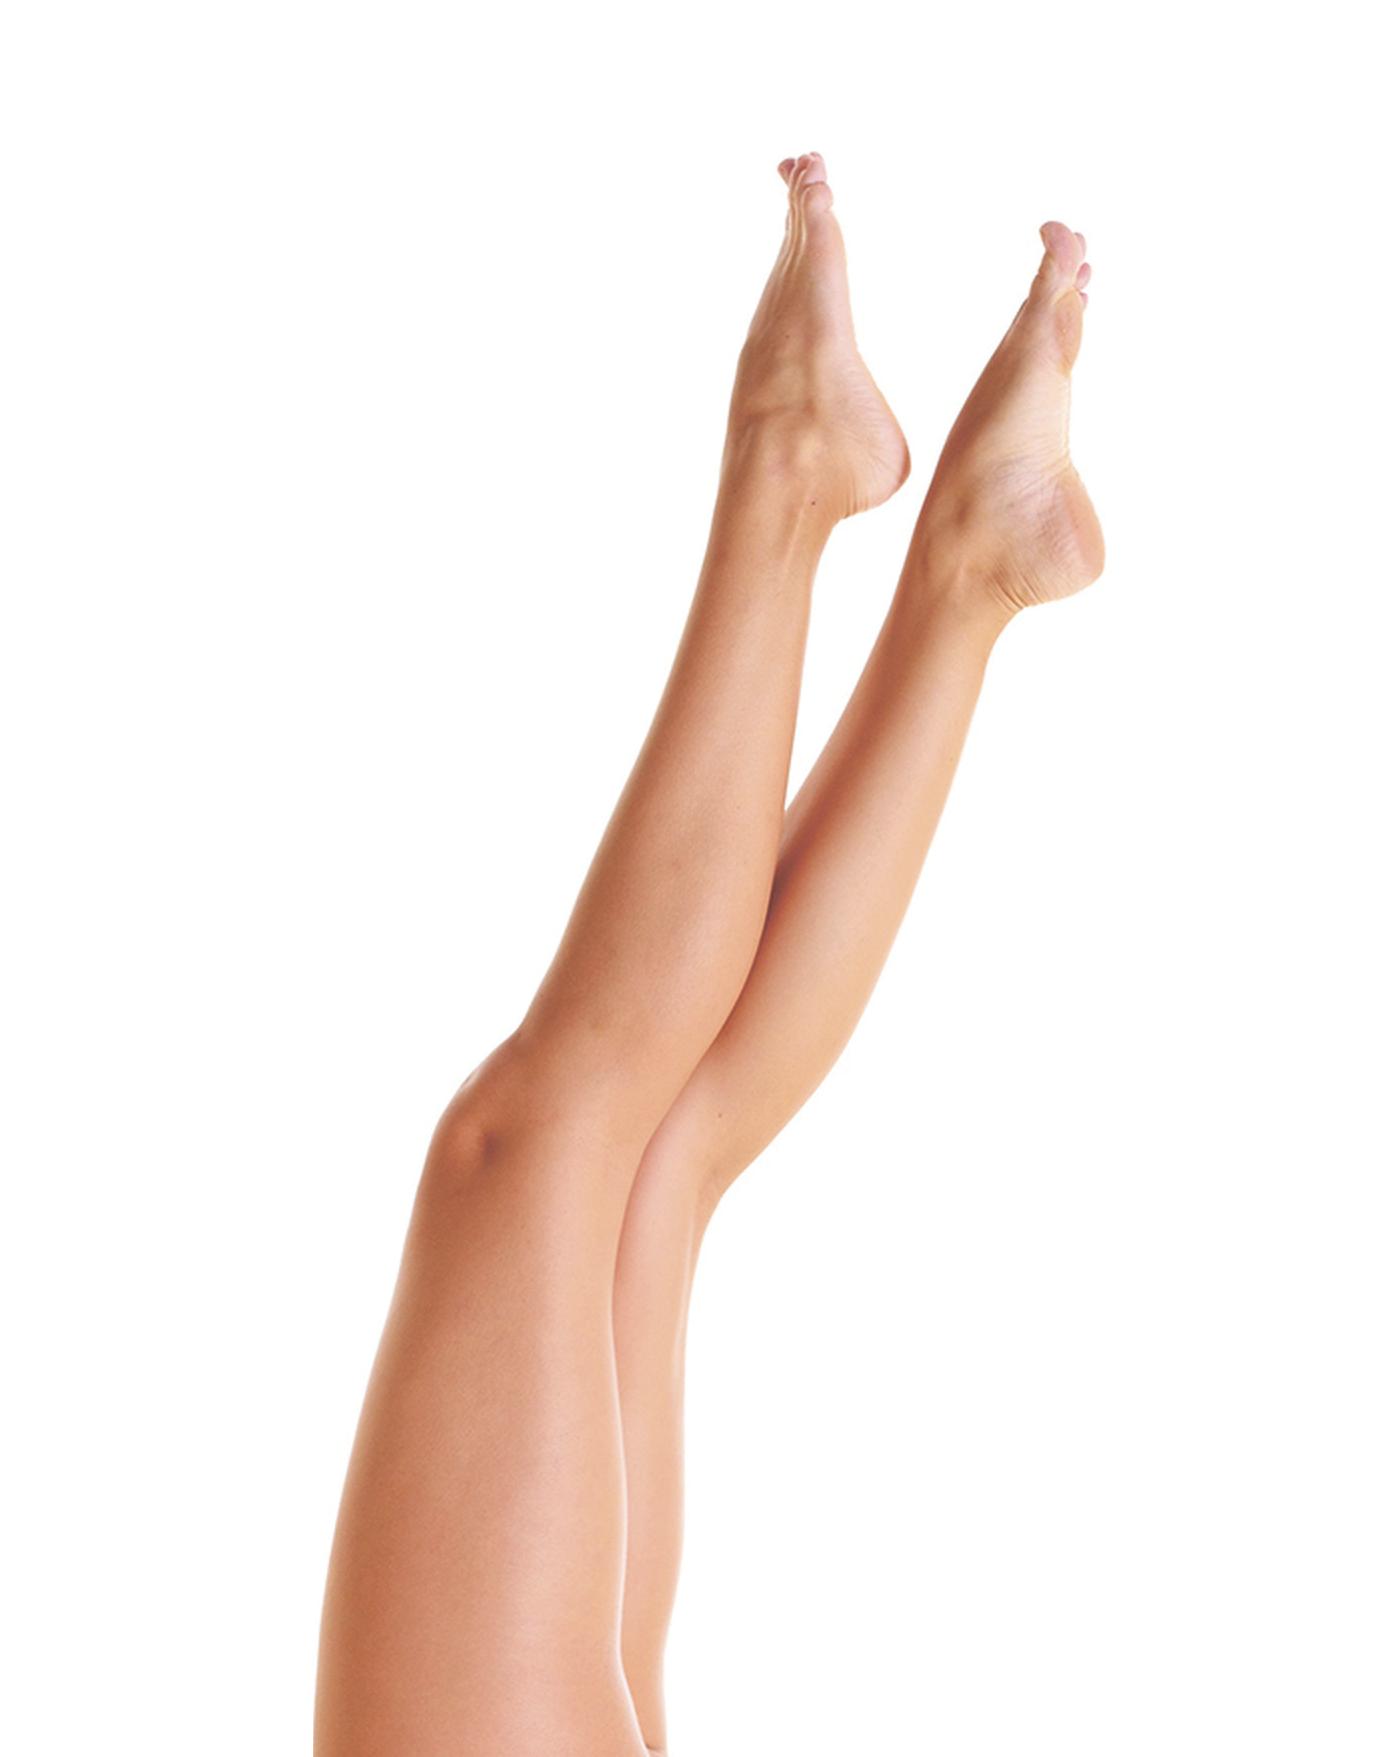 Women legs png image. Hand clipart hip